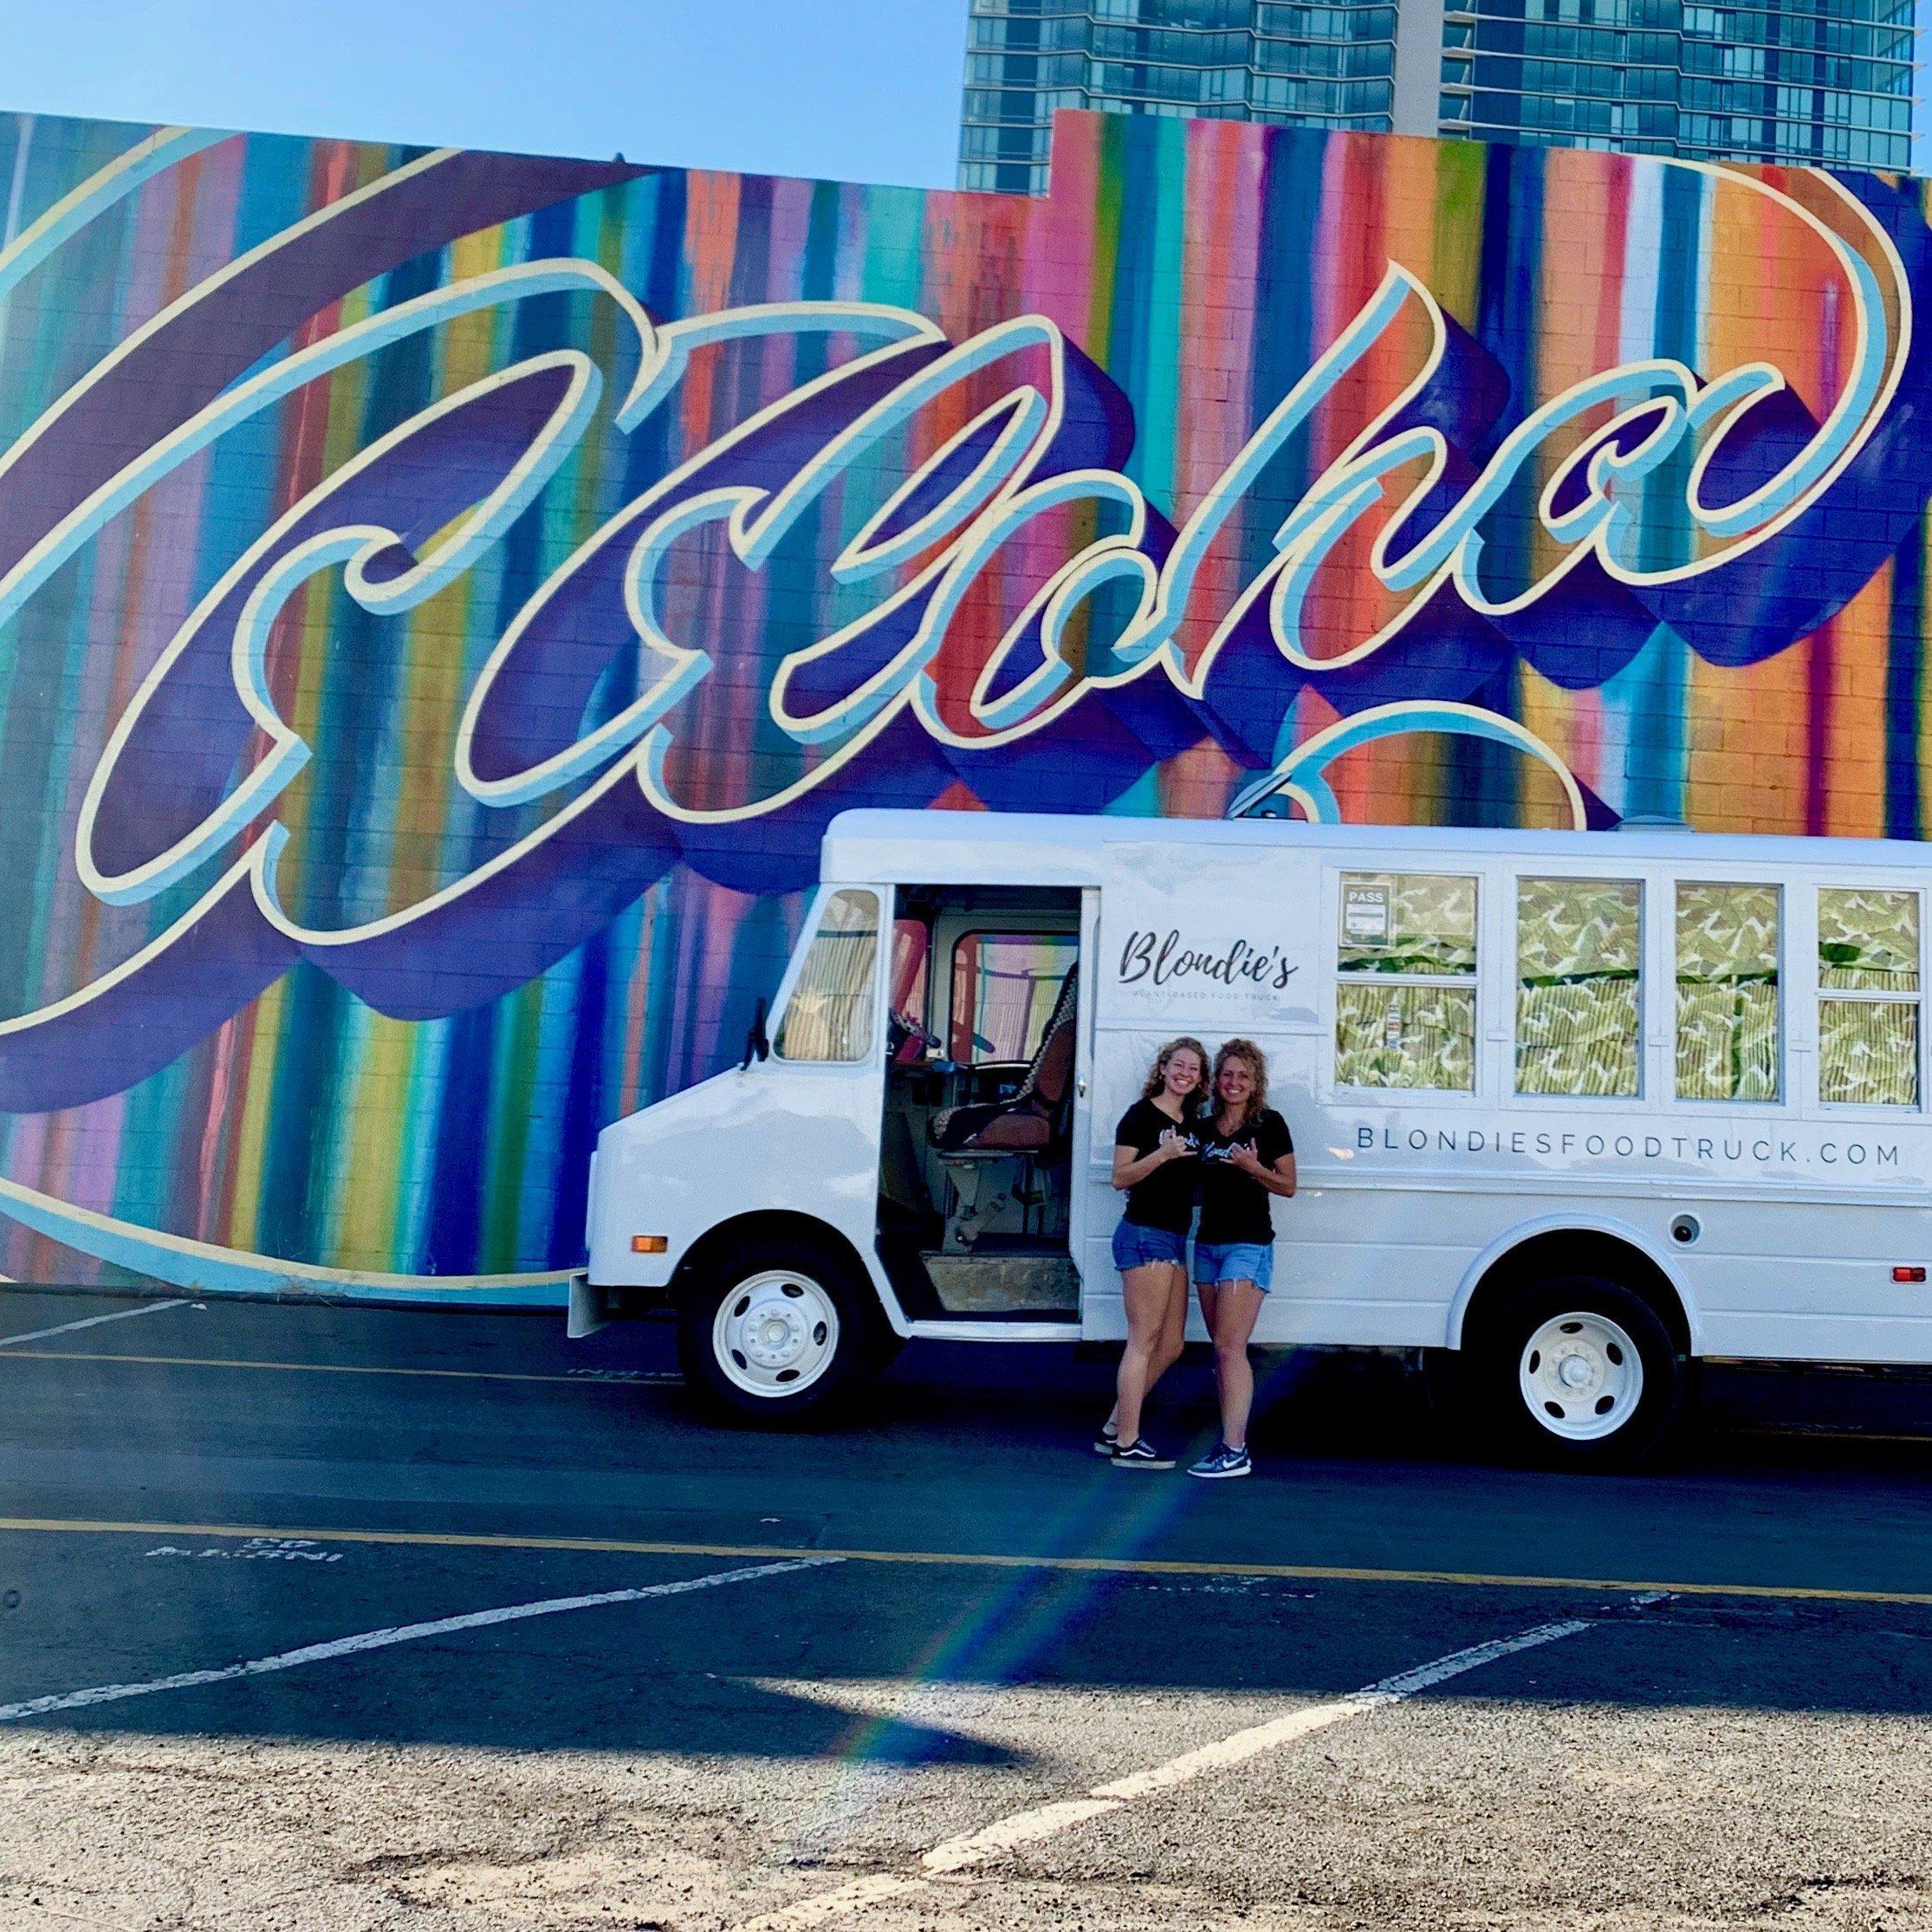 Hawaii Honolulu Waikiki FoodTruck Vegetarian Vegan